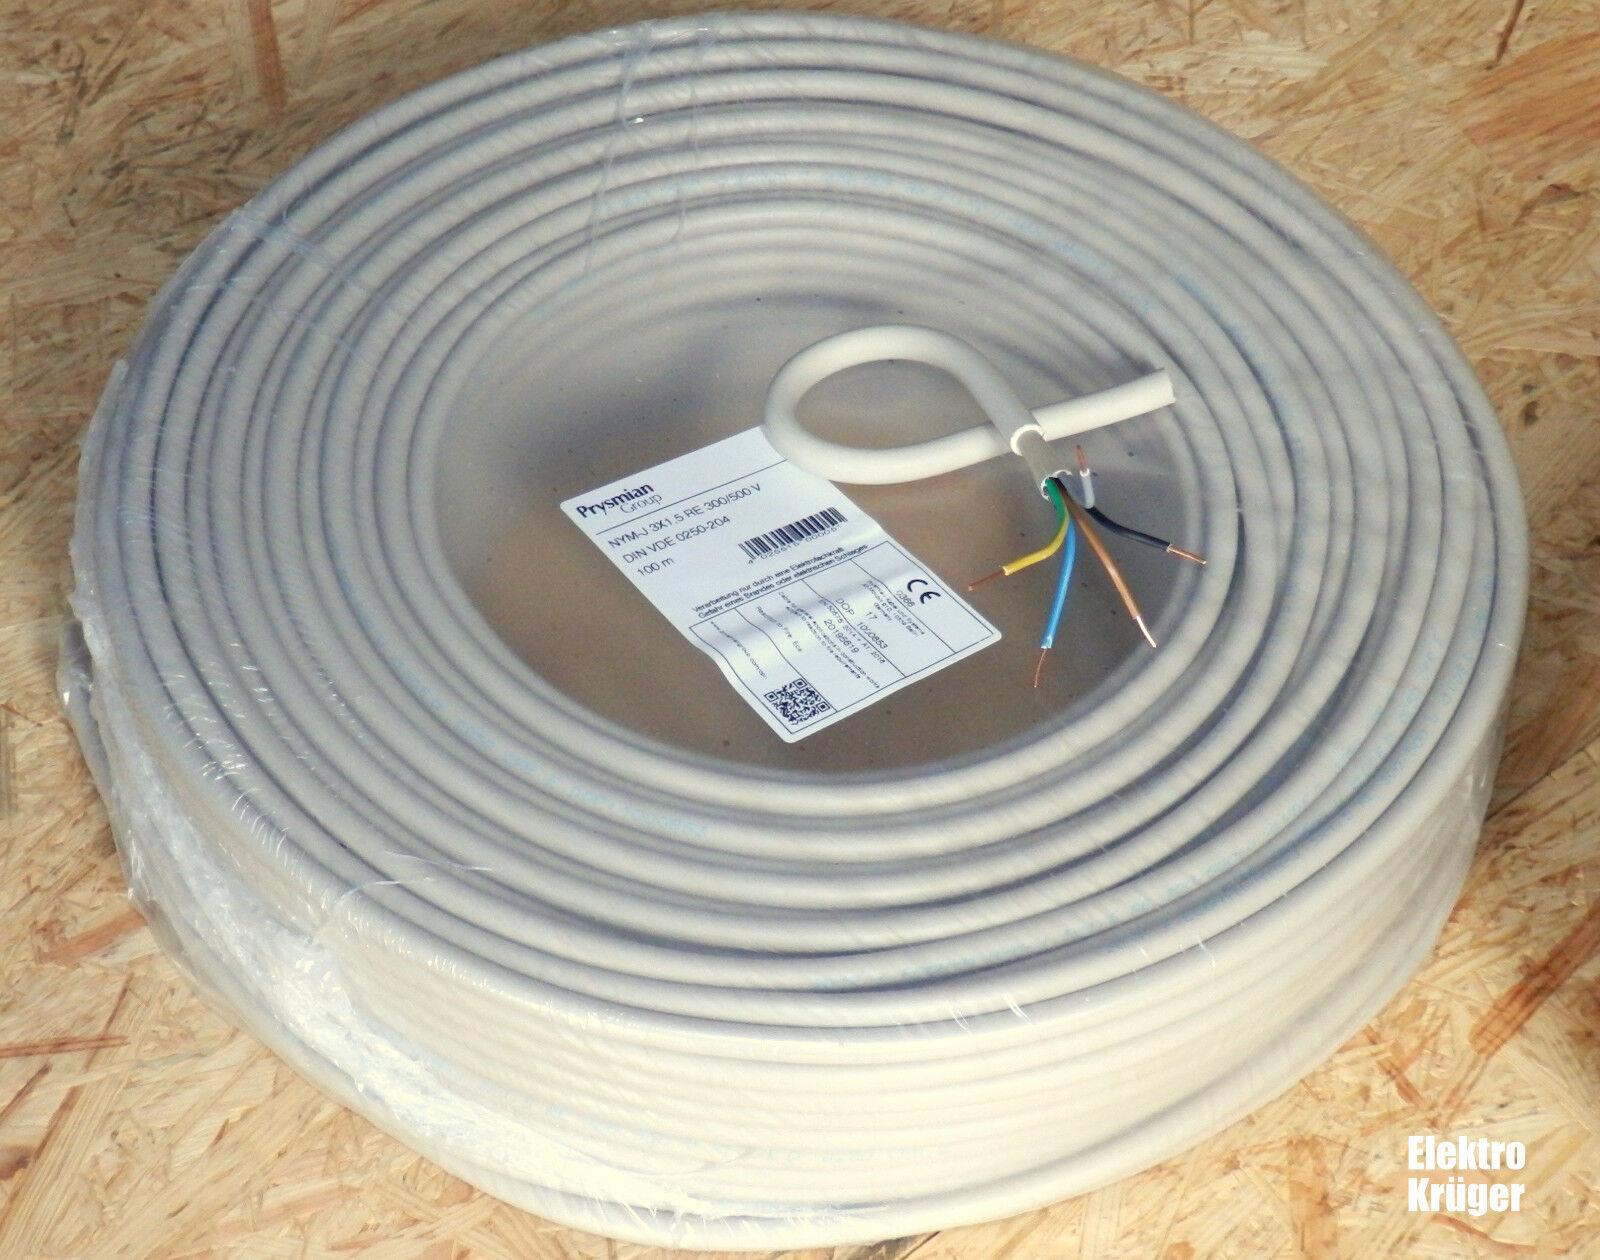 NYM-J 5X1,5 Mantelleitung Installationsleitung Elektrokabel 5-100 Meter VDE CE